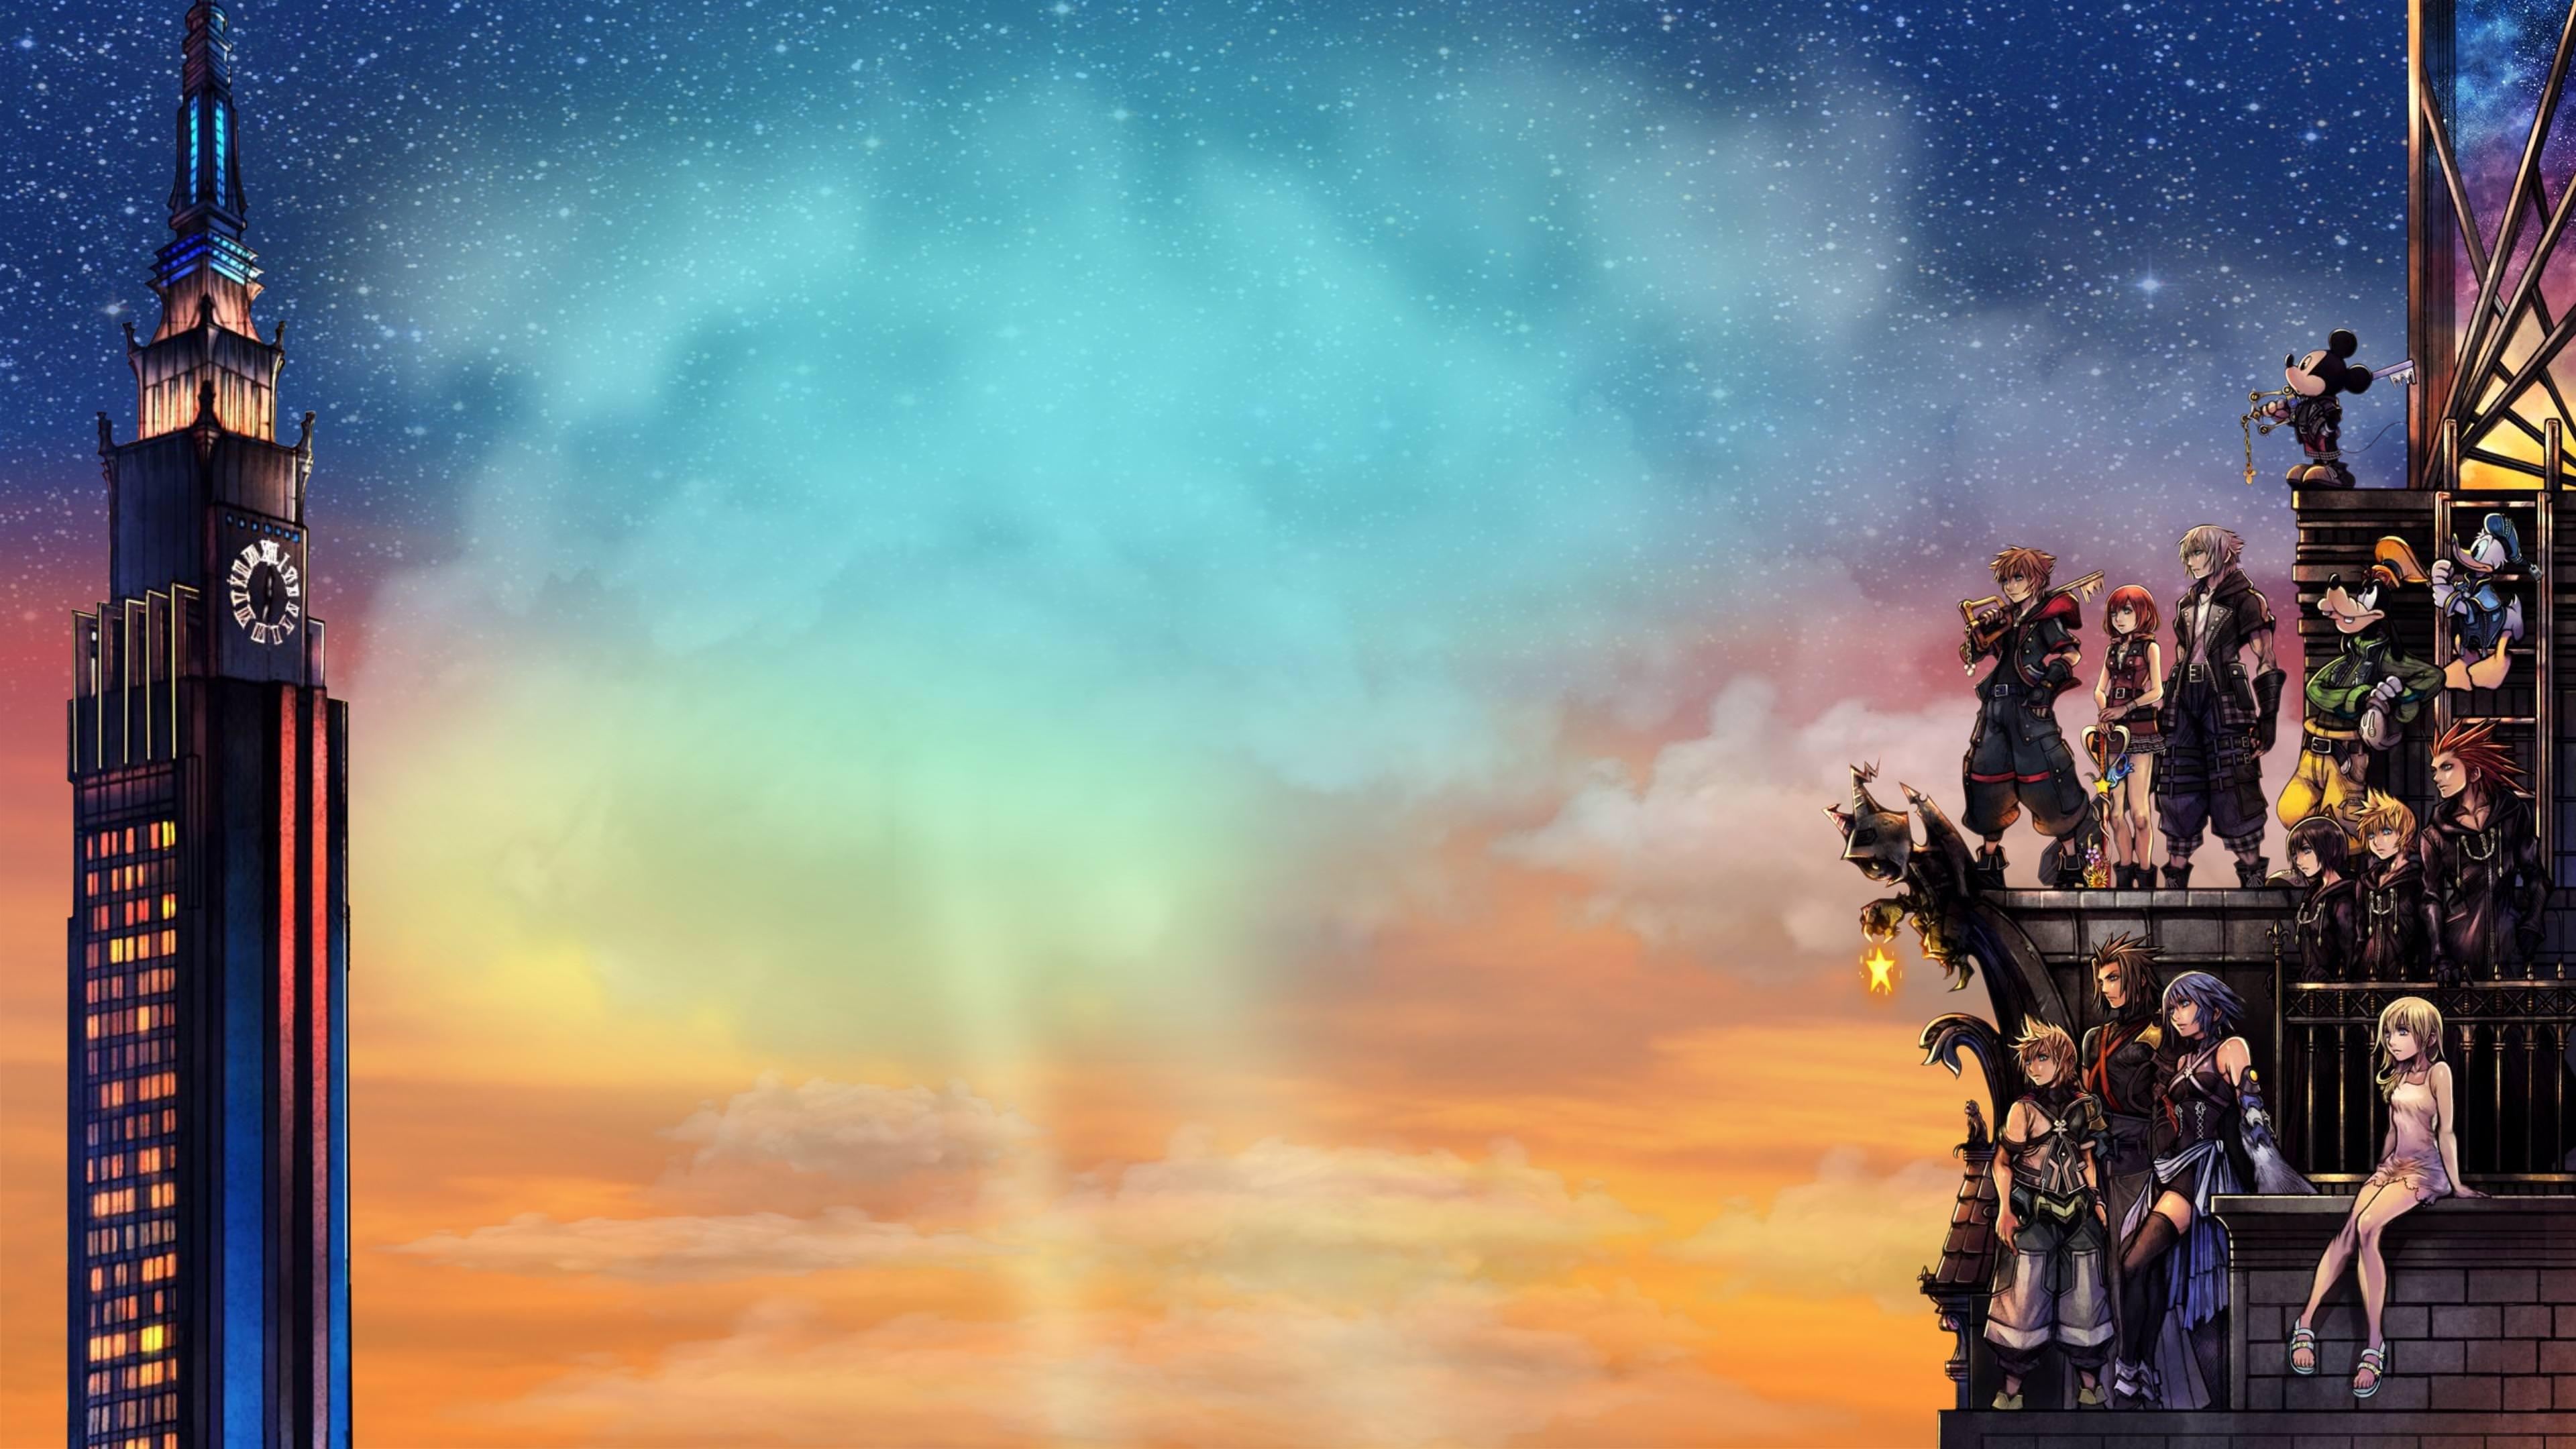 Kingdom Hearts Iii Cover Art Wallpaper 4k Ultra Hd Wallpaper